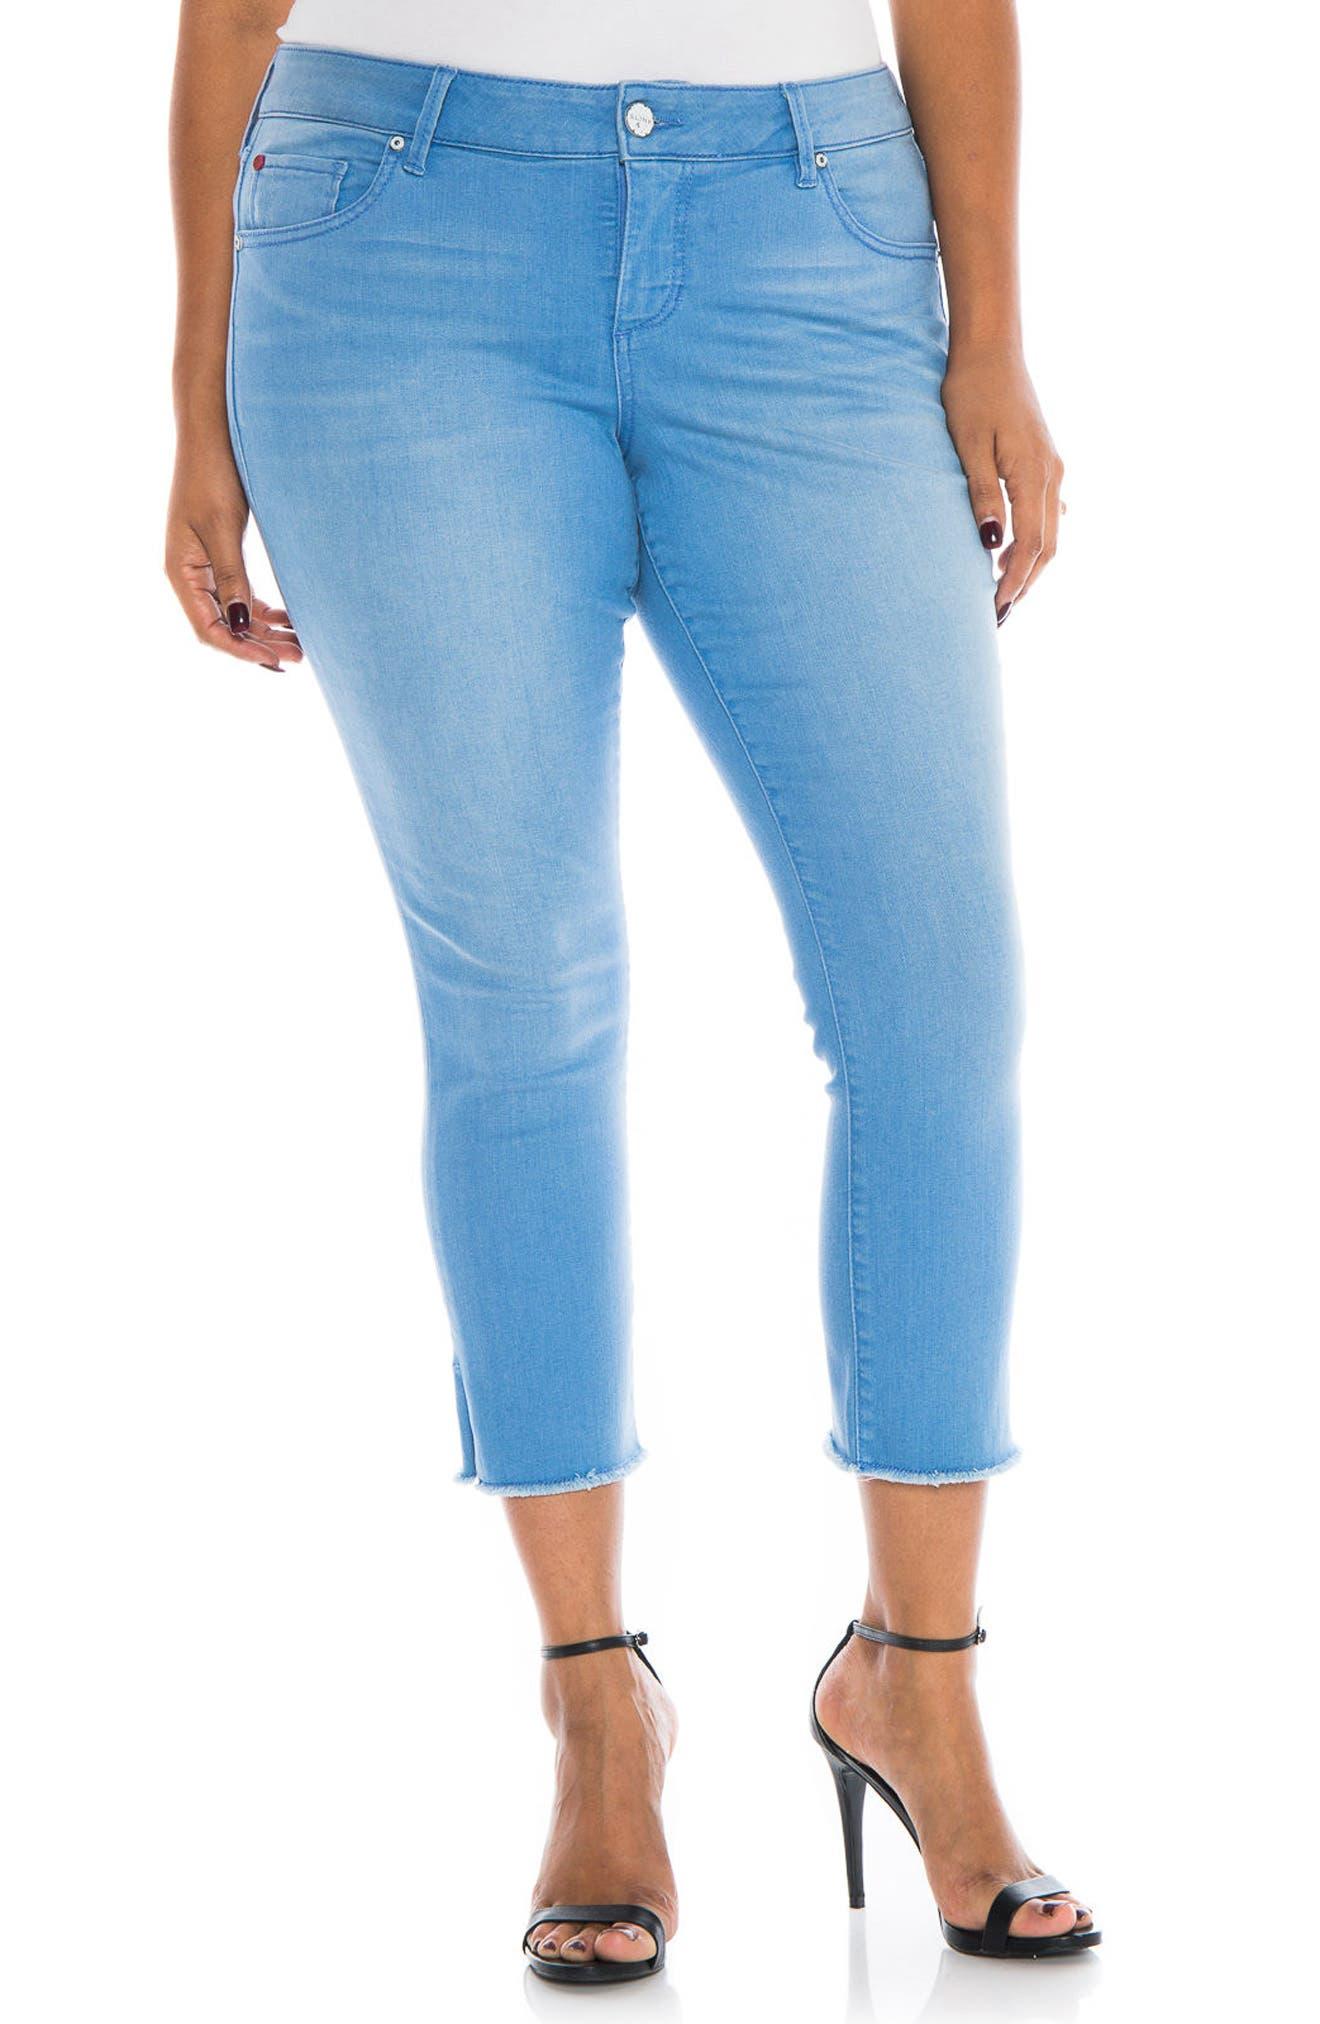 SLINK Jeans Fray Hem Crop Skinny Jeans (Cloe) (Plus Size)